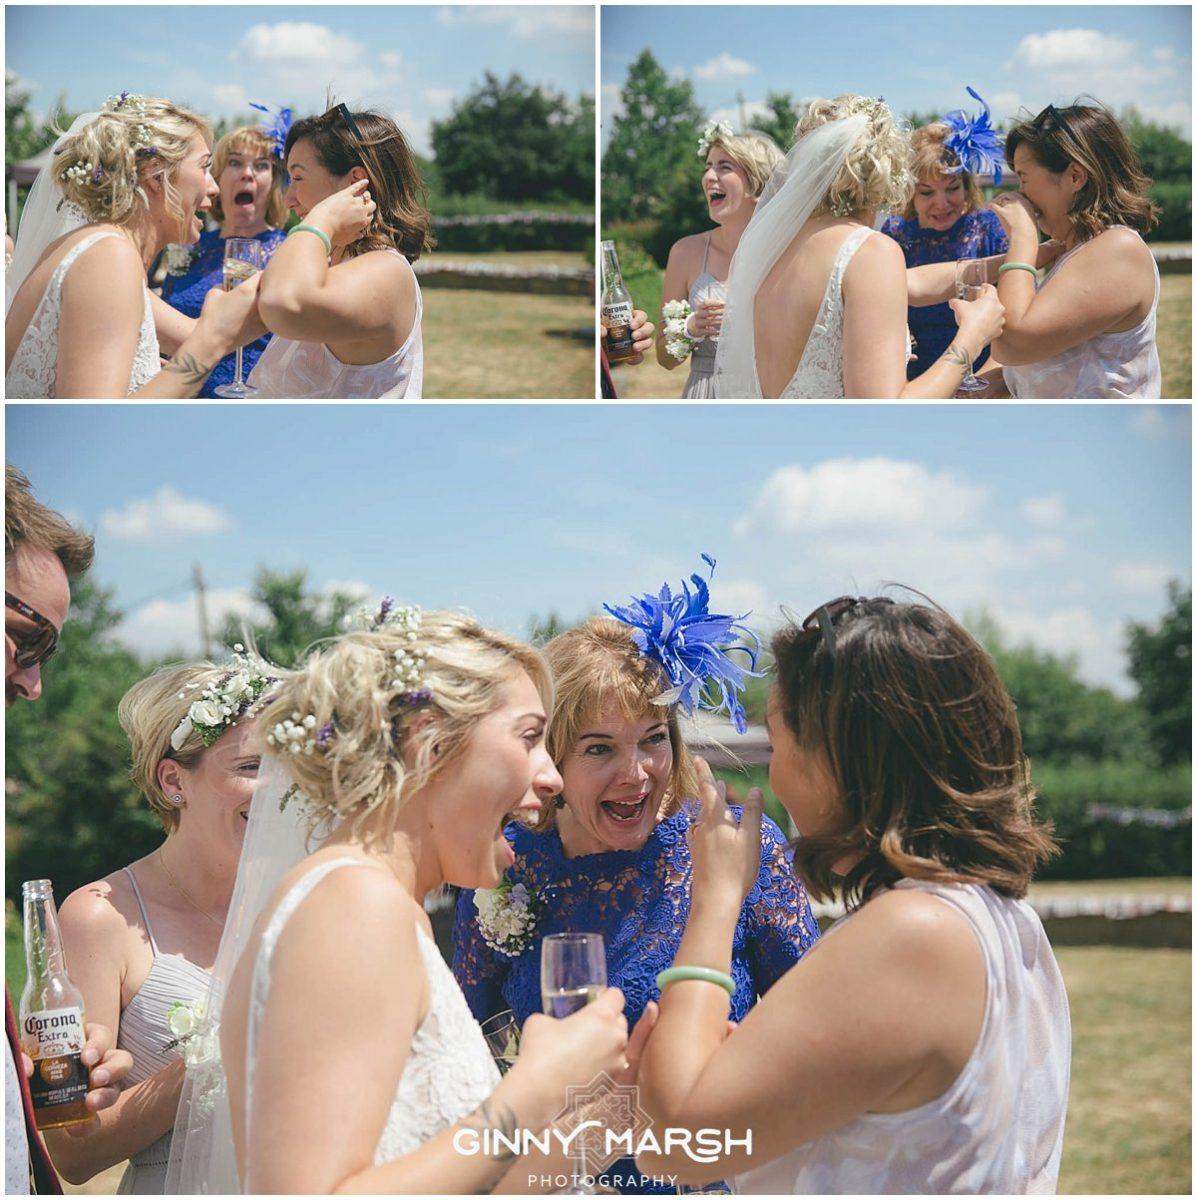 Boho Summer wedding photography | Groomes wedding venue Surrey